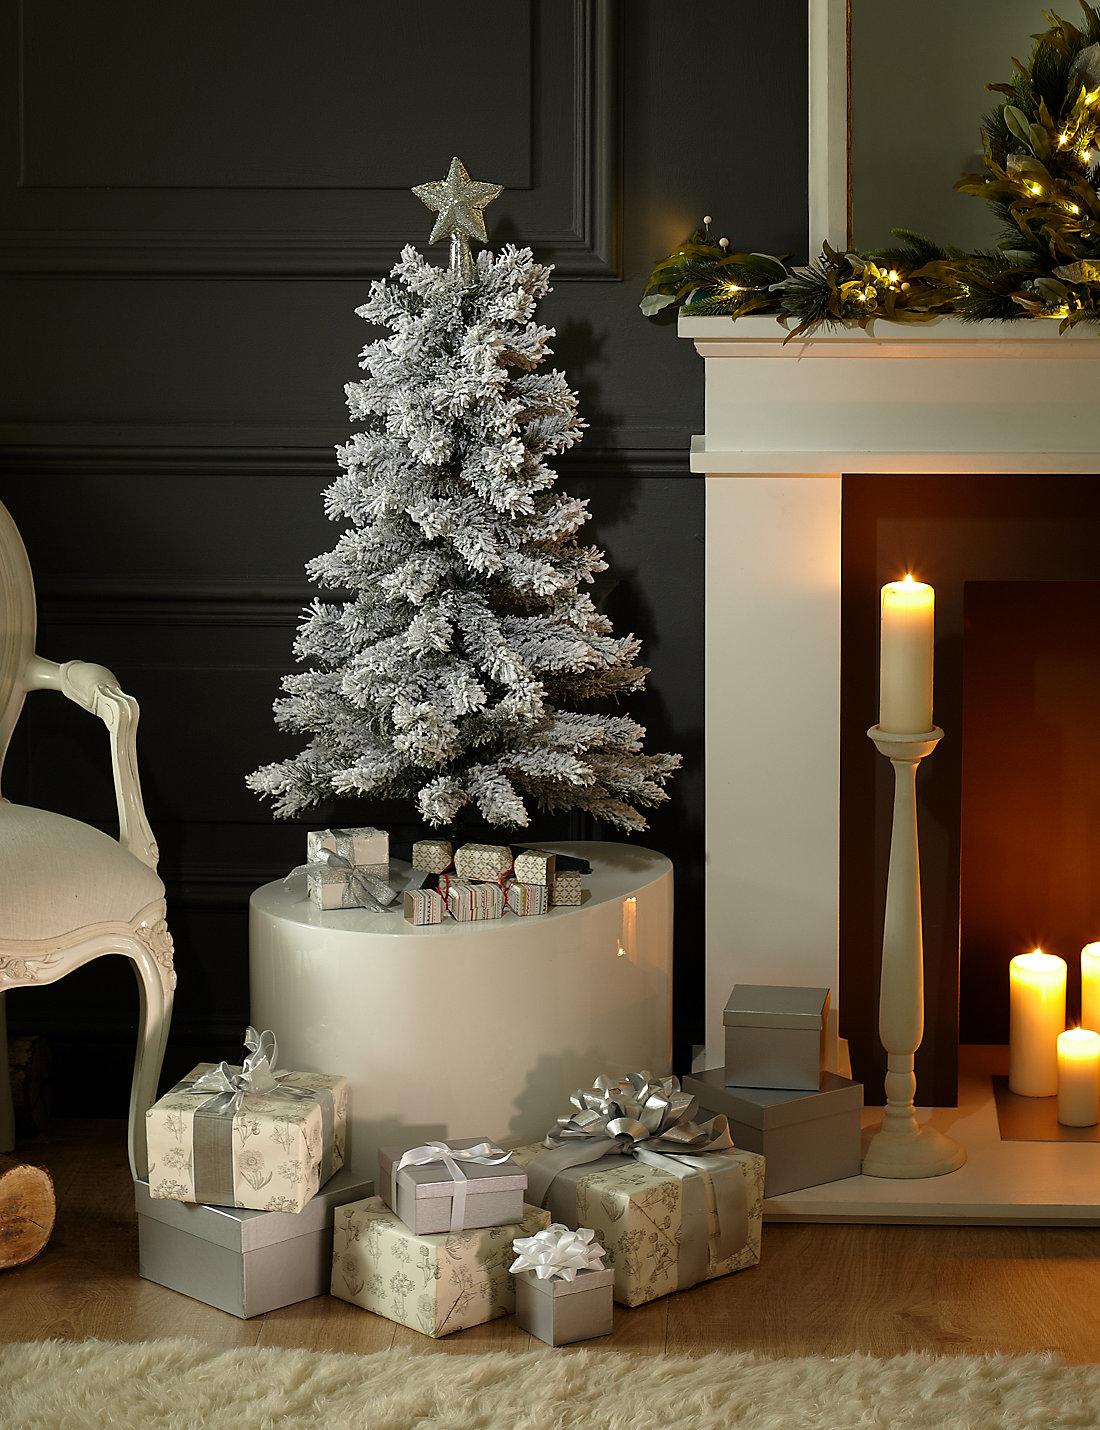 3ft snow effect green christmas tree - 3 Ft Christmas Tree